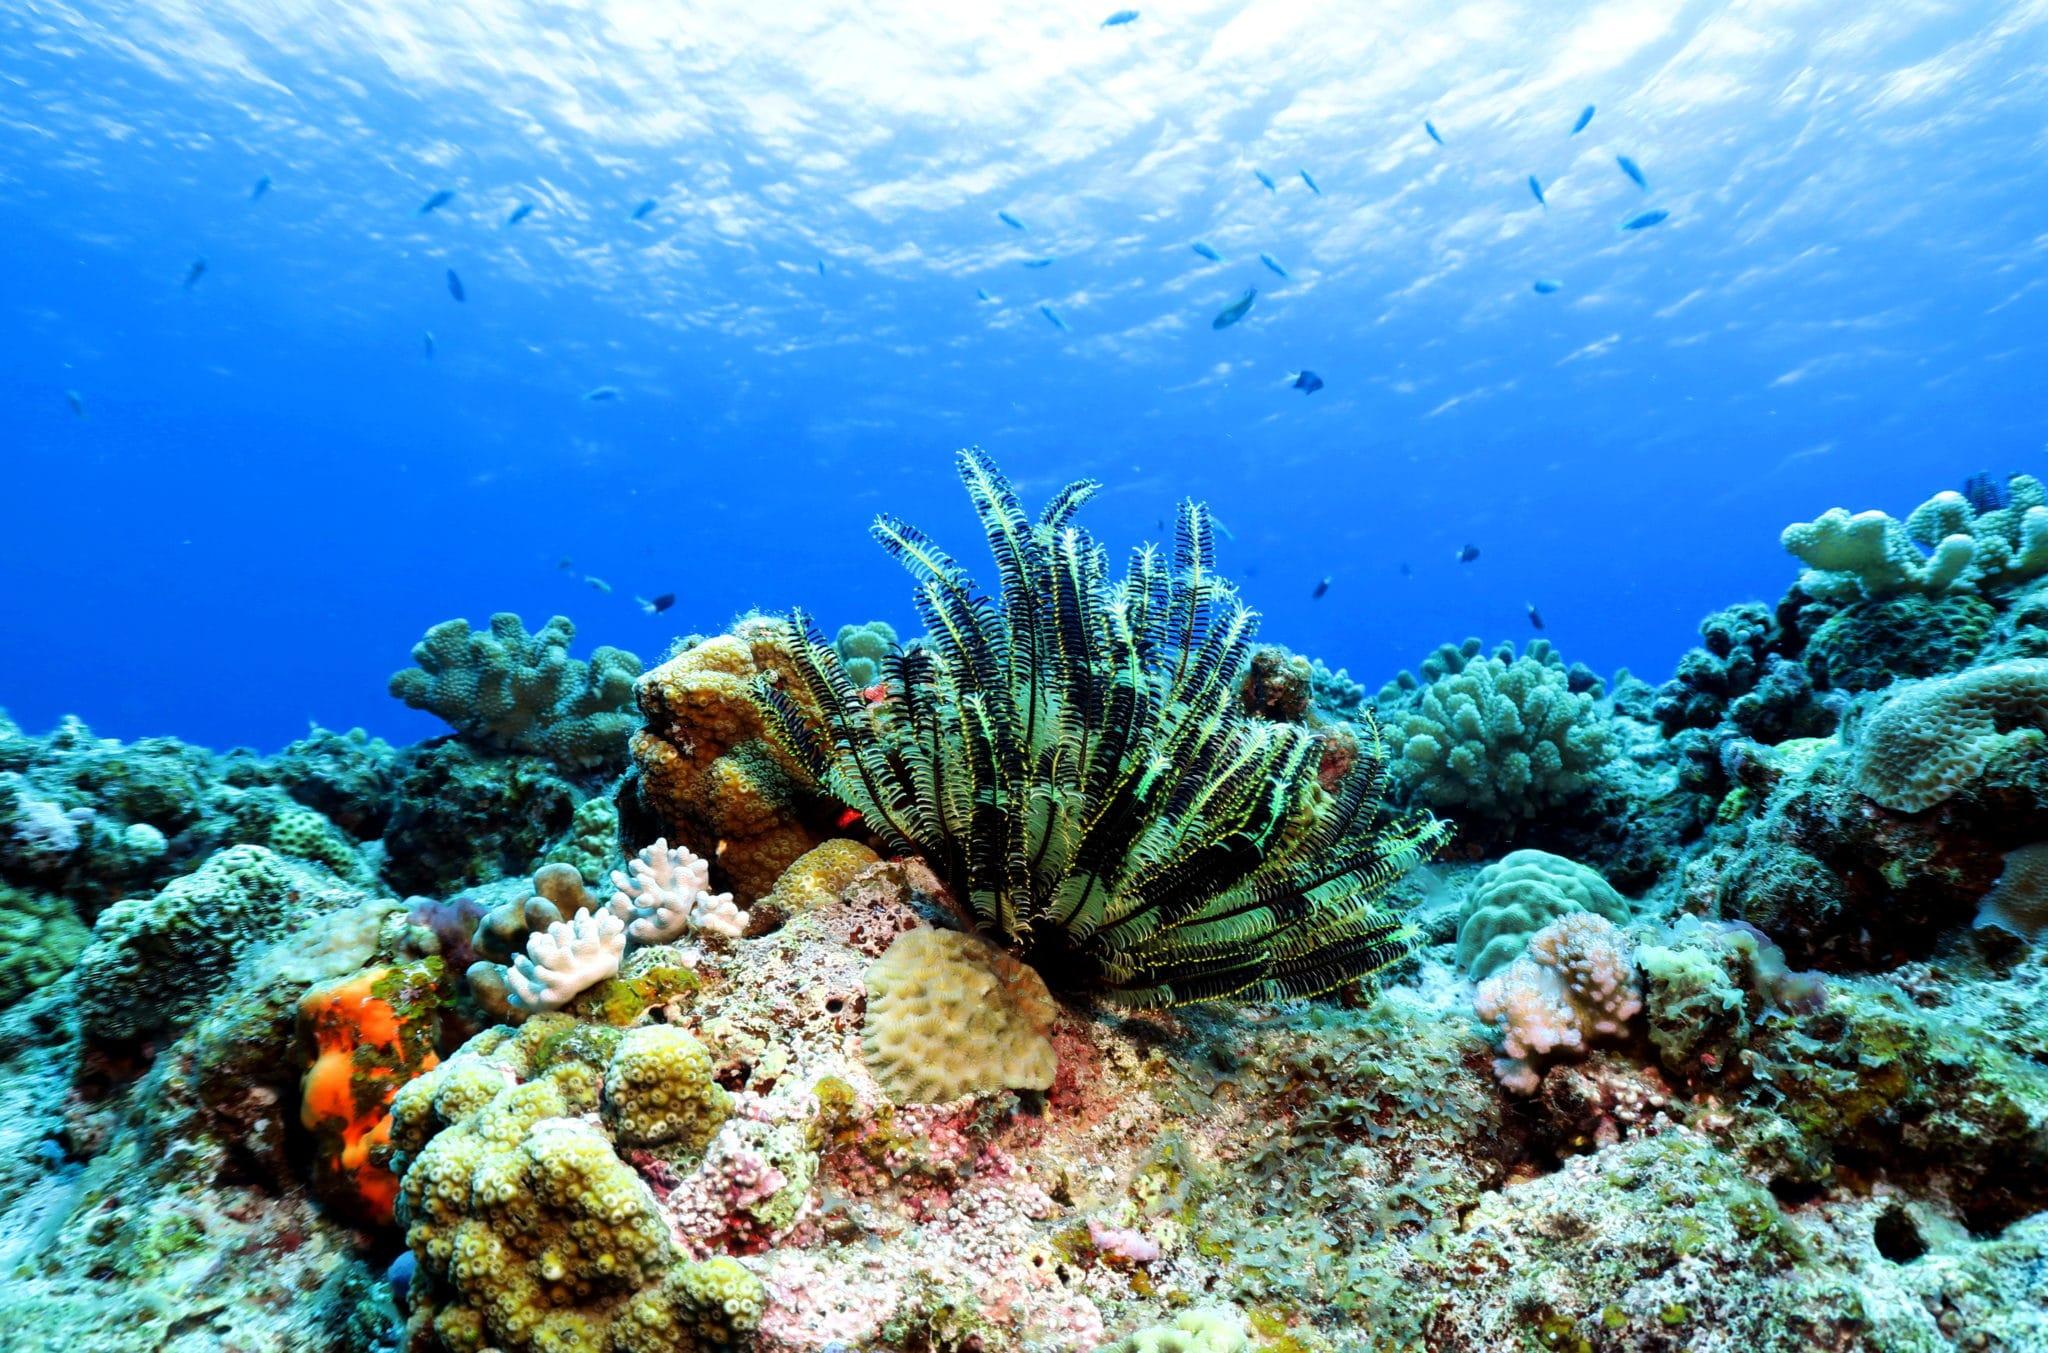 Scuba diving in the Kerama Islands Okinawa Japan